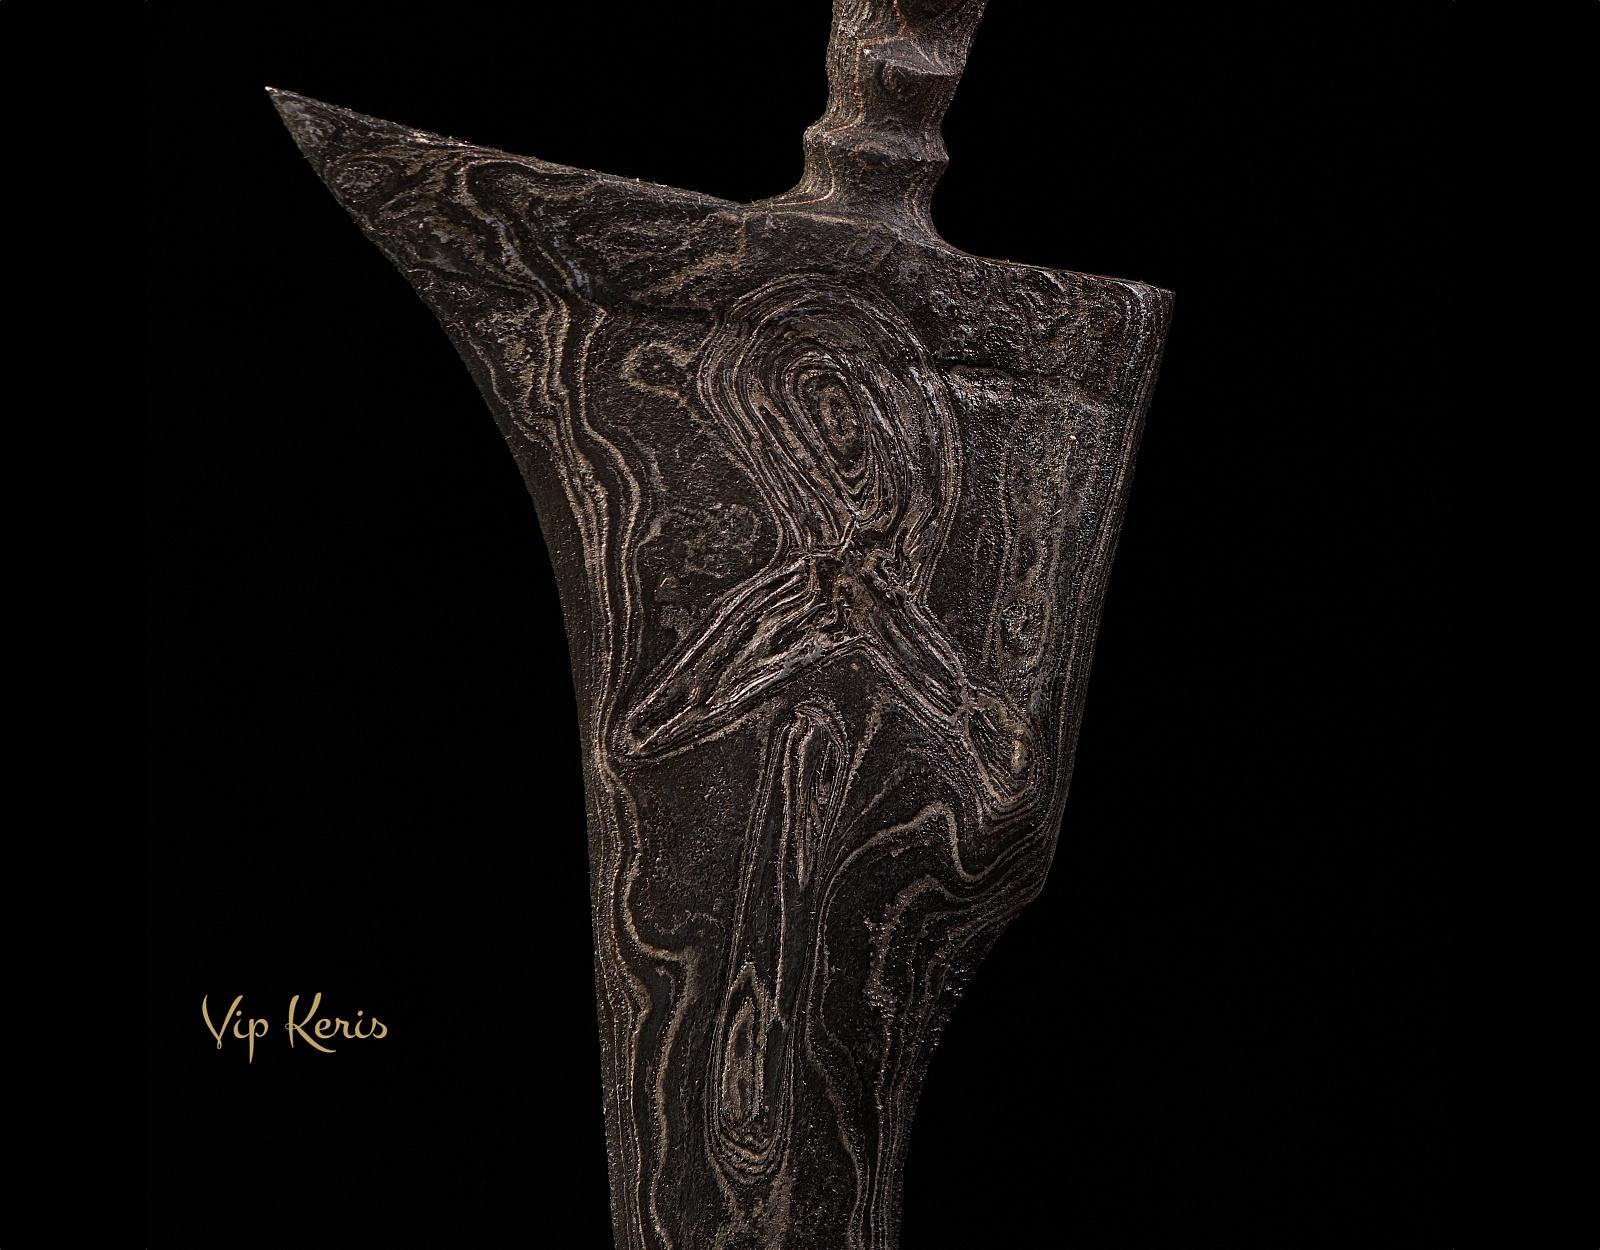 Кинжал Крис Putut Sajen Luk5, Волшебник Наставник фото VipKeris